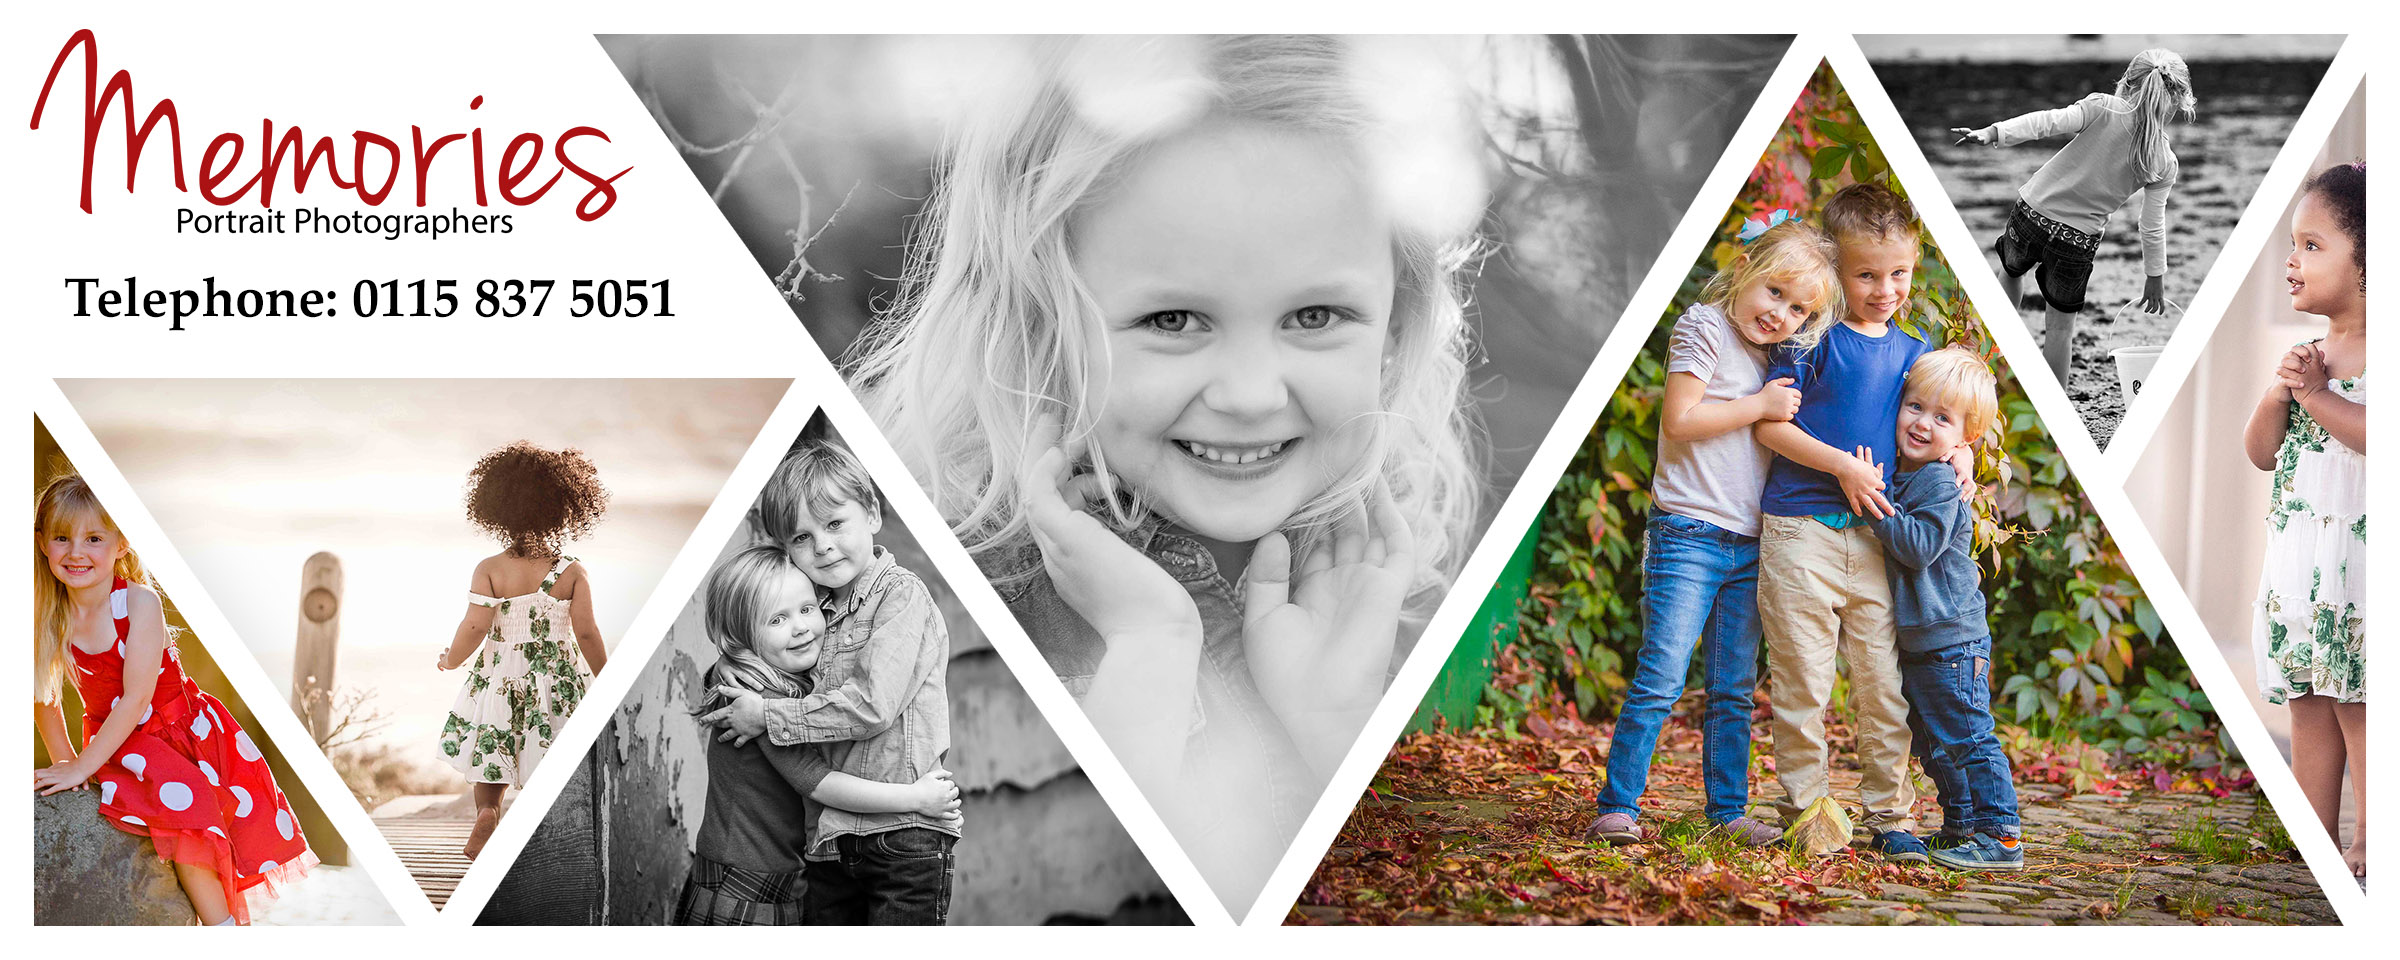 Memories | Family Photo shoot Nottingham | Couples & Families